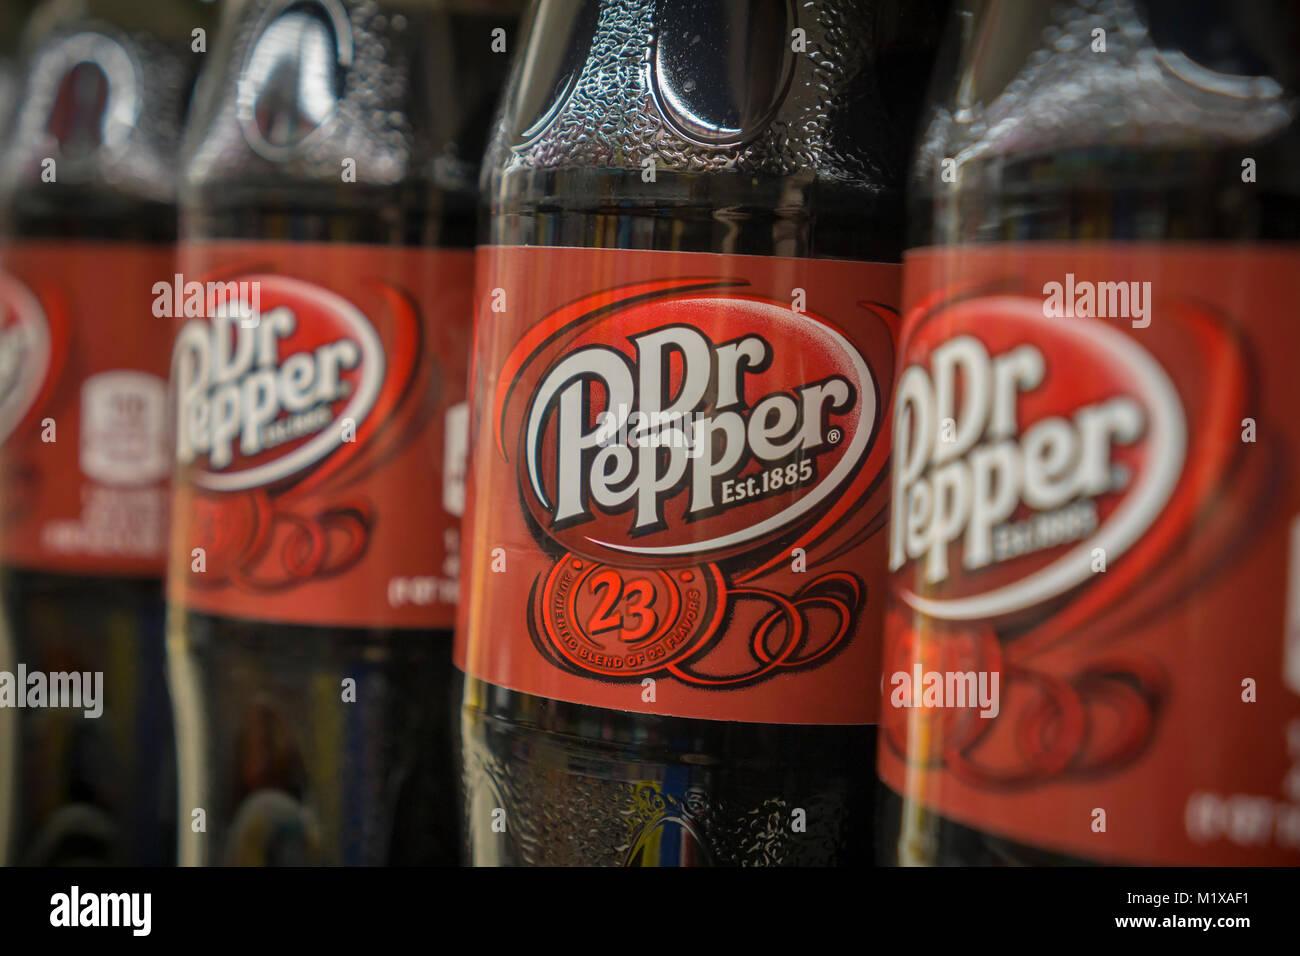 Bottles of Dr. Pepper soda on a supermarket shelf in New York on Monday, January 29, 2018. JAB Holding Co.'s - Stock Image